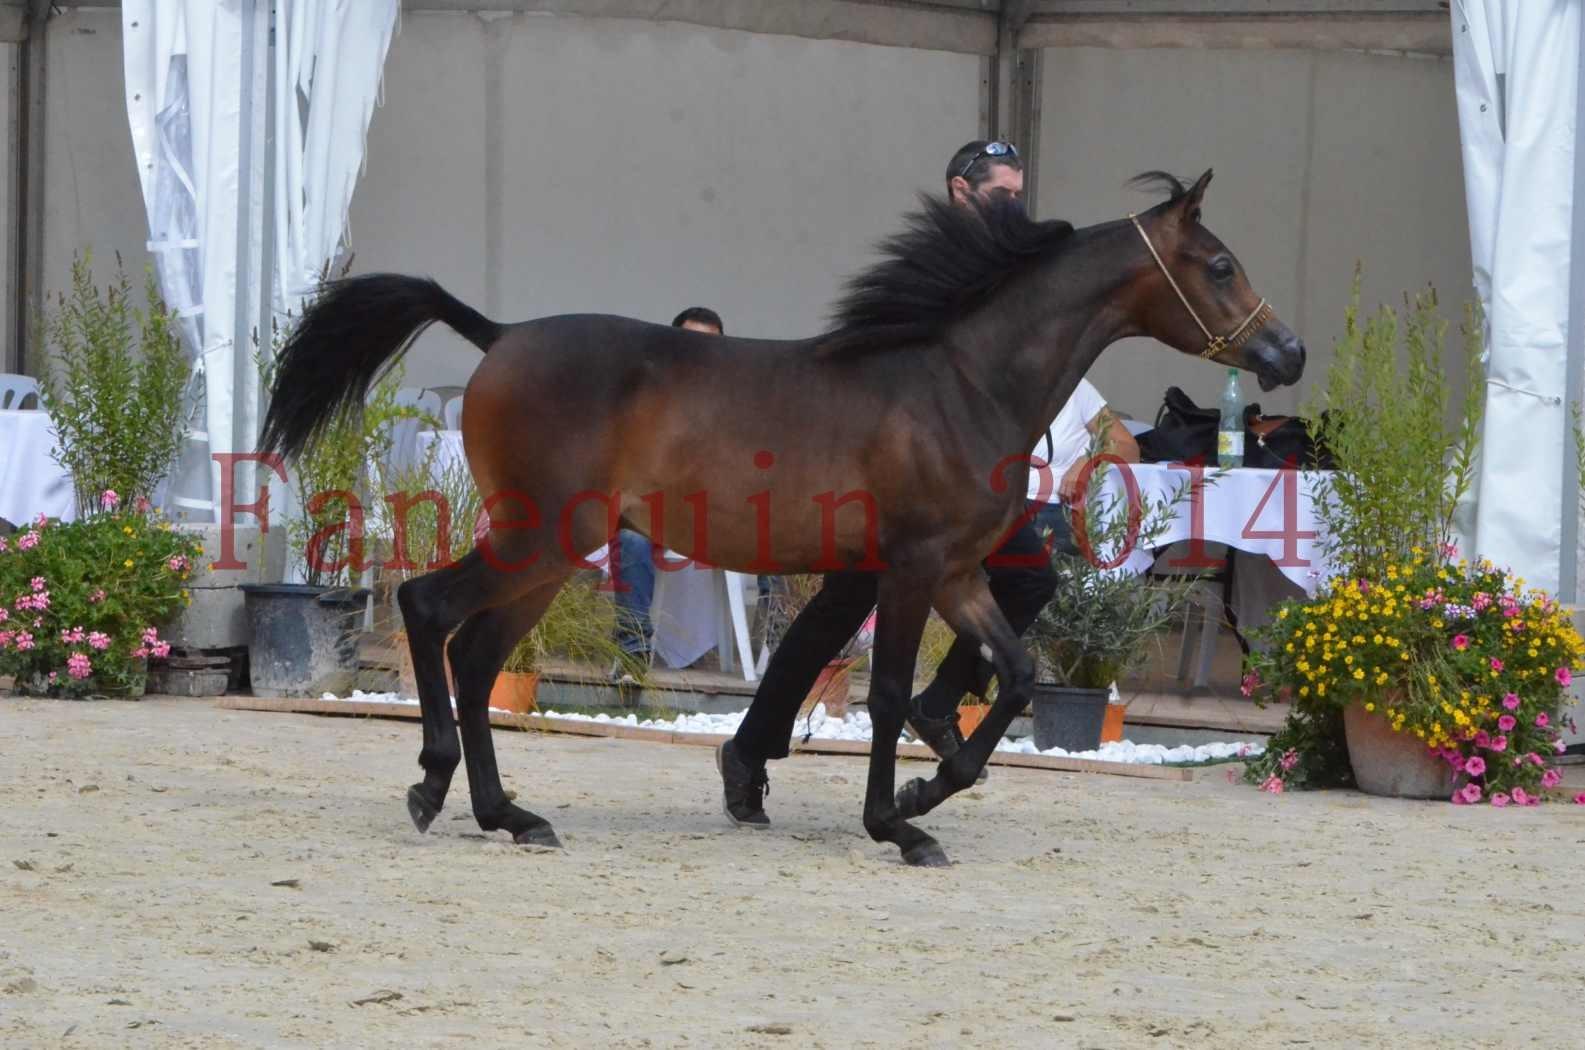 Championnat de FRANCE 2014 - Amateurs - SH FARAJAA - 25